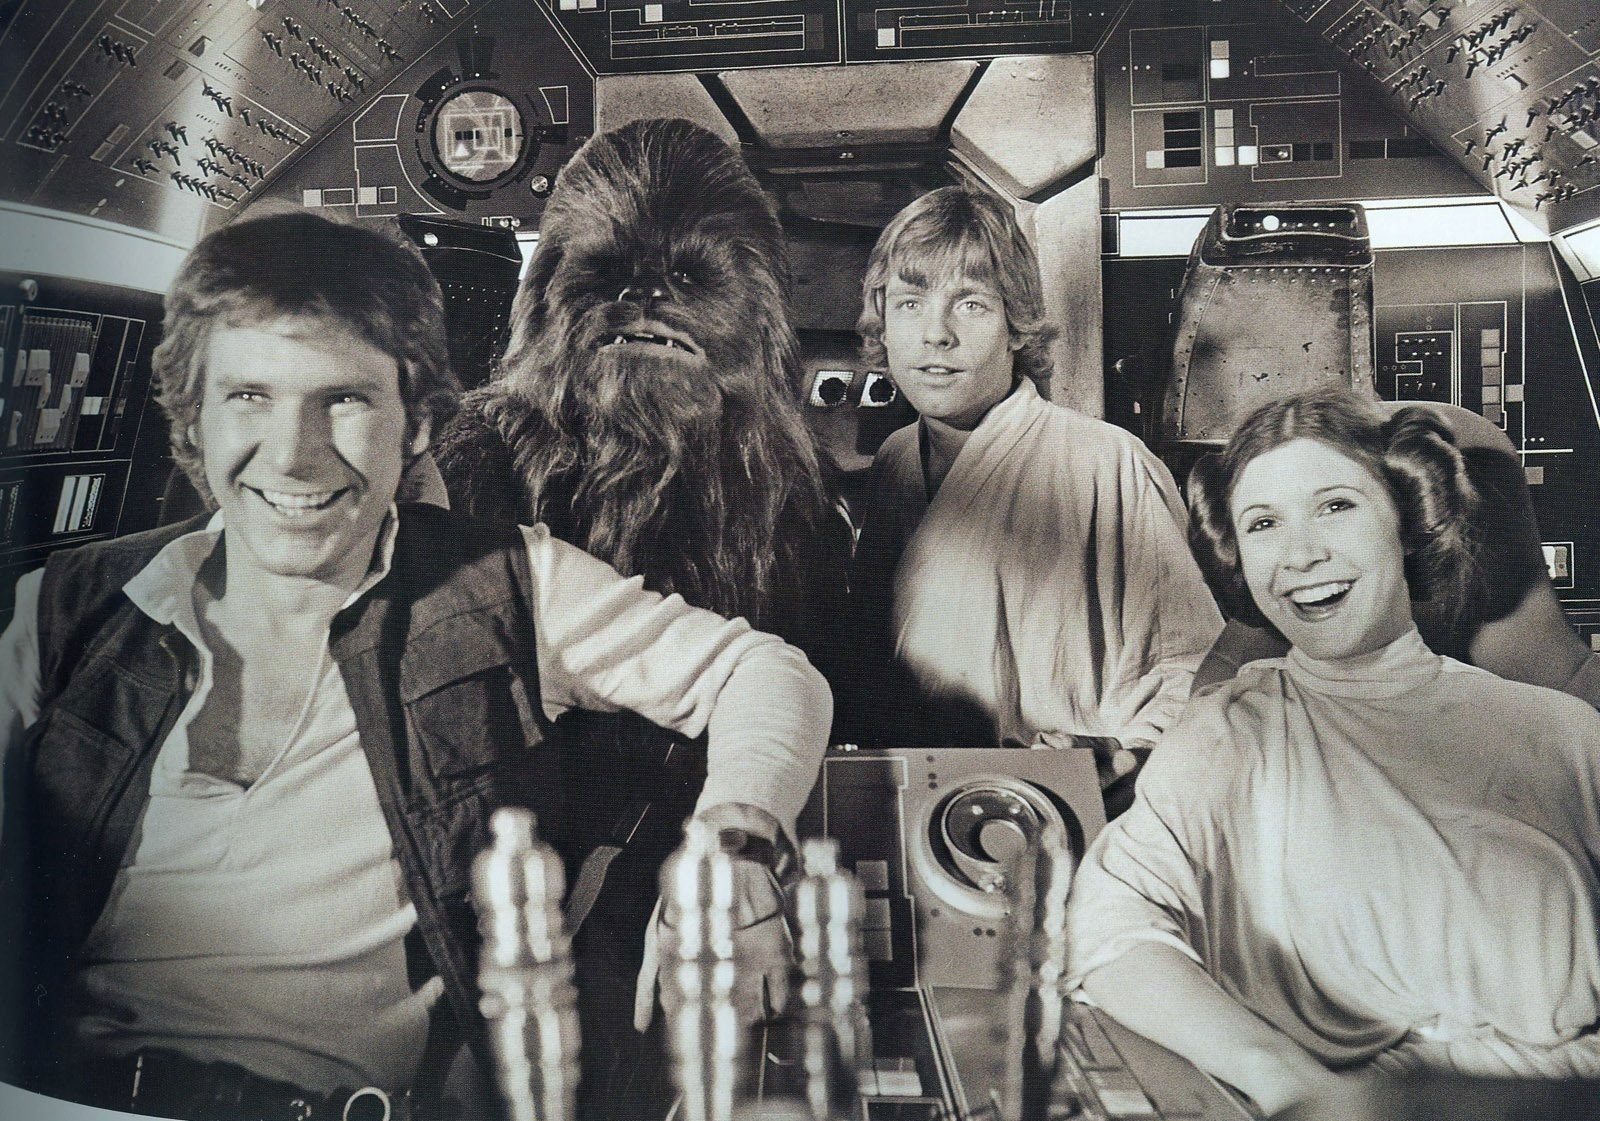 Princess-Leia-behind-the-scenes-starwars9